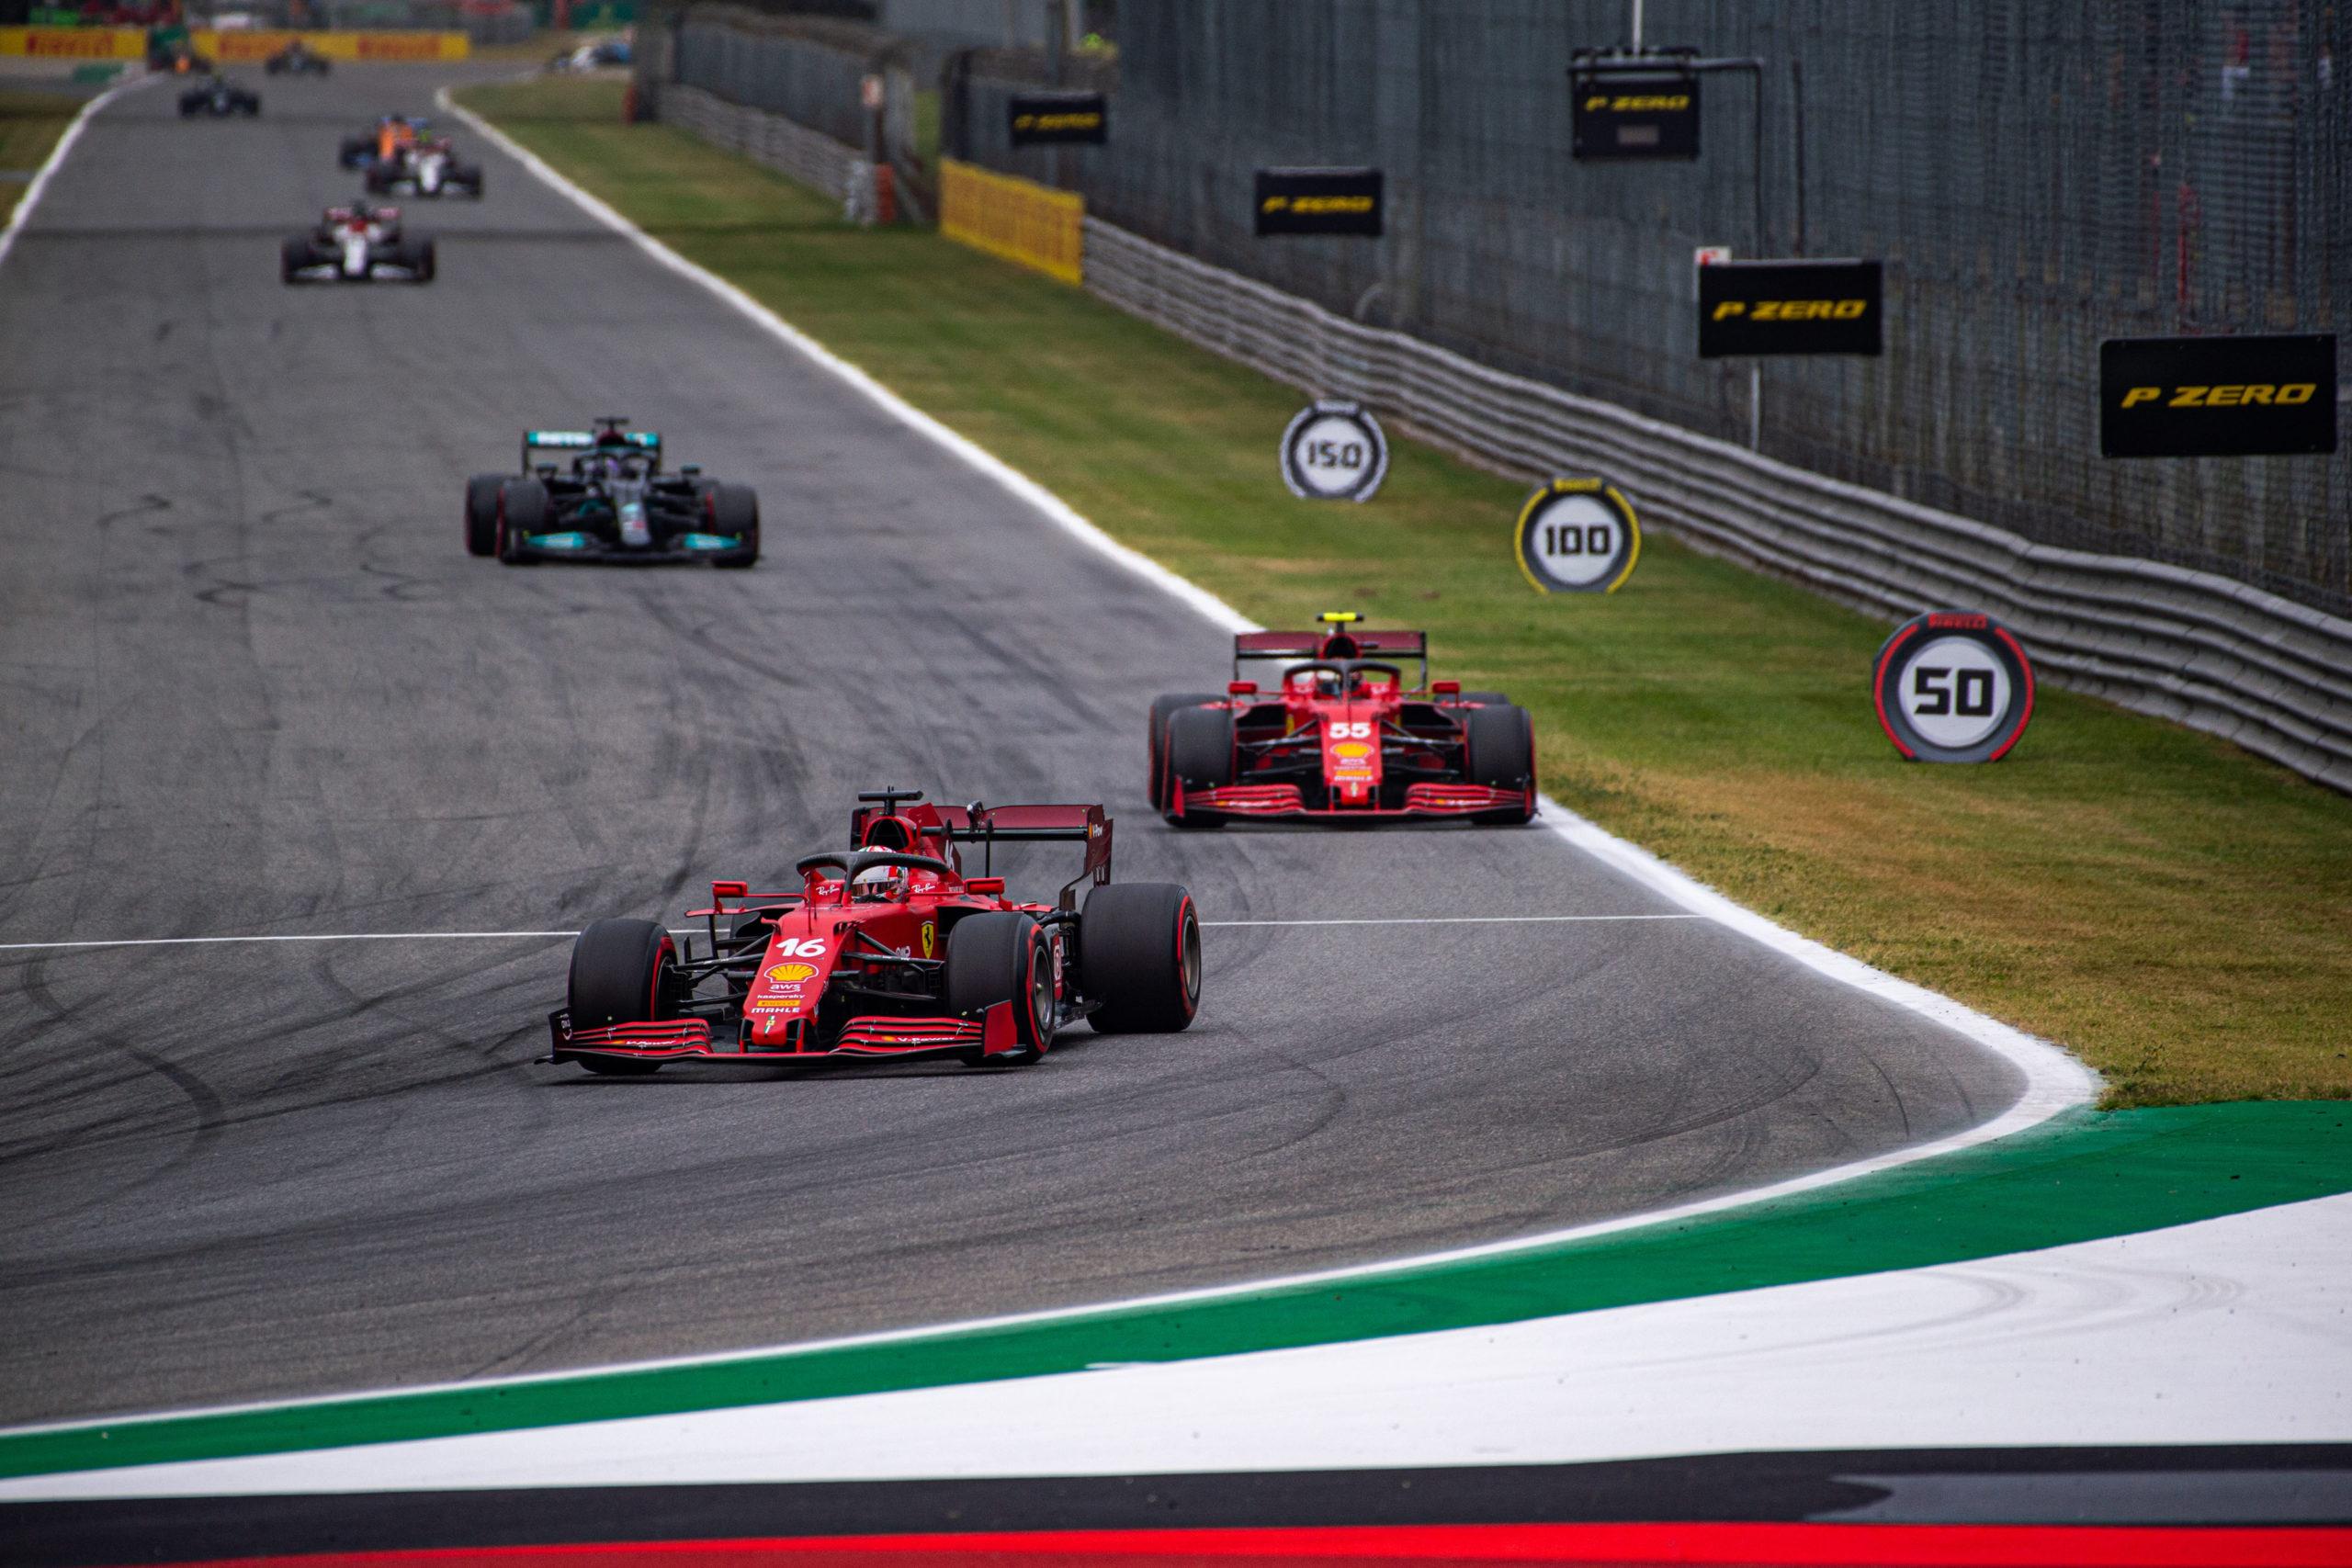 Carlos Sainz and Charles Leclerc, Ferrari, GP ITALIA F1/2021 - VENERDI 10/09/2021  credit: @Scuderia Ferrari Press Office